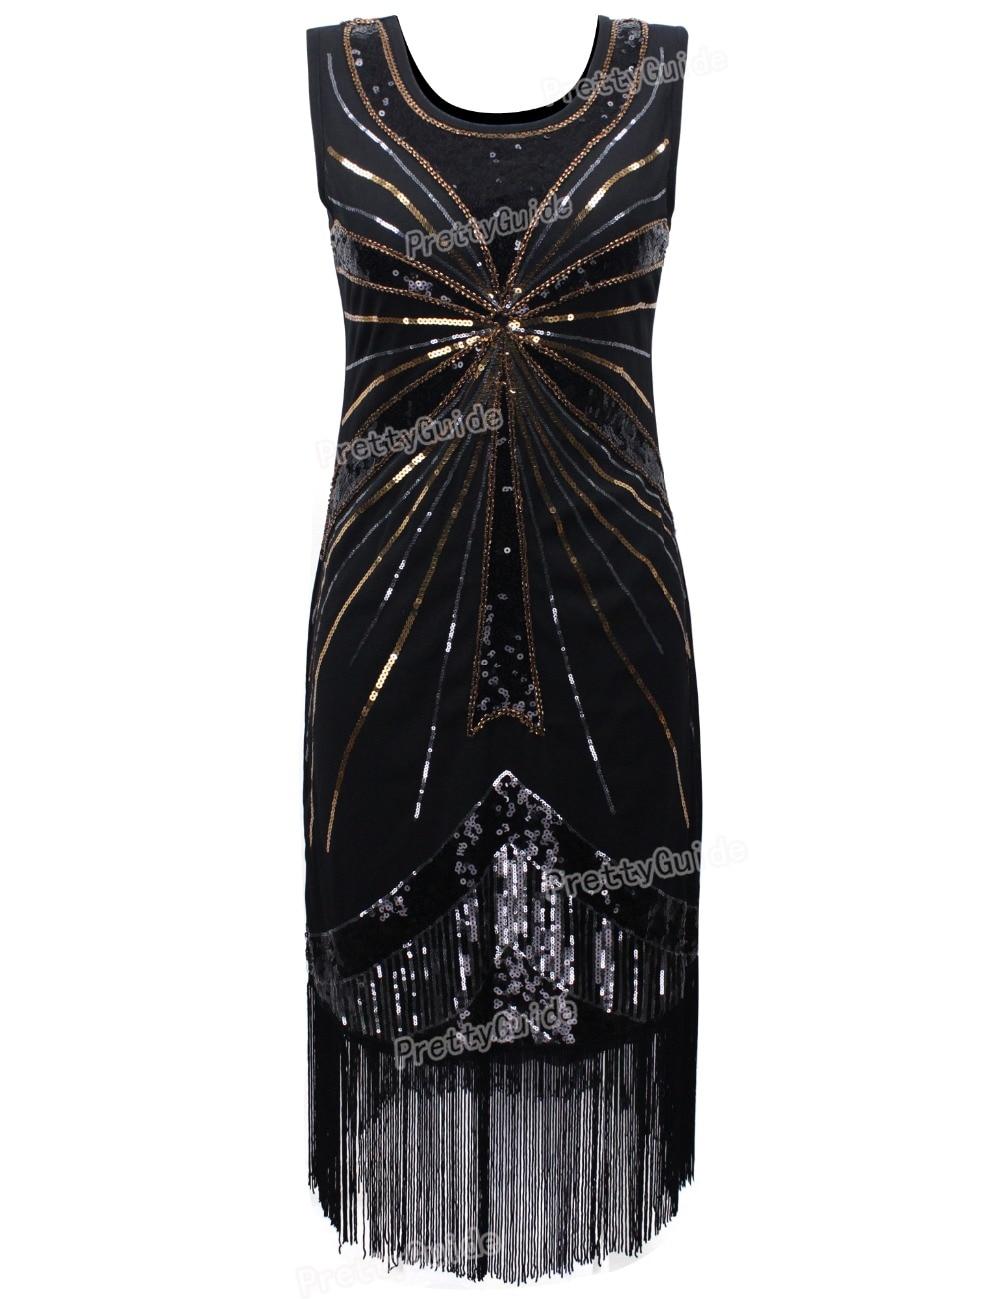 Prettyguide Women 1920s Vintage Beads Sequin Fireworks Fringe Fler Dress Party Roaring 20s Great Gatsby